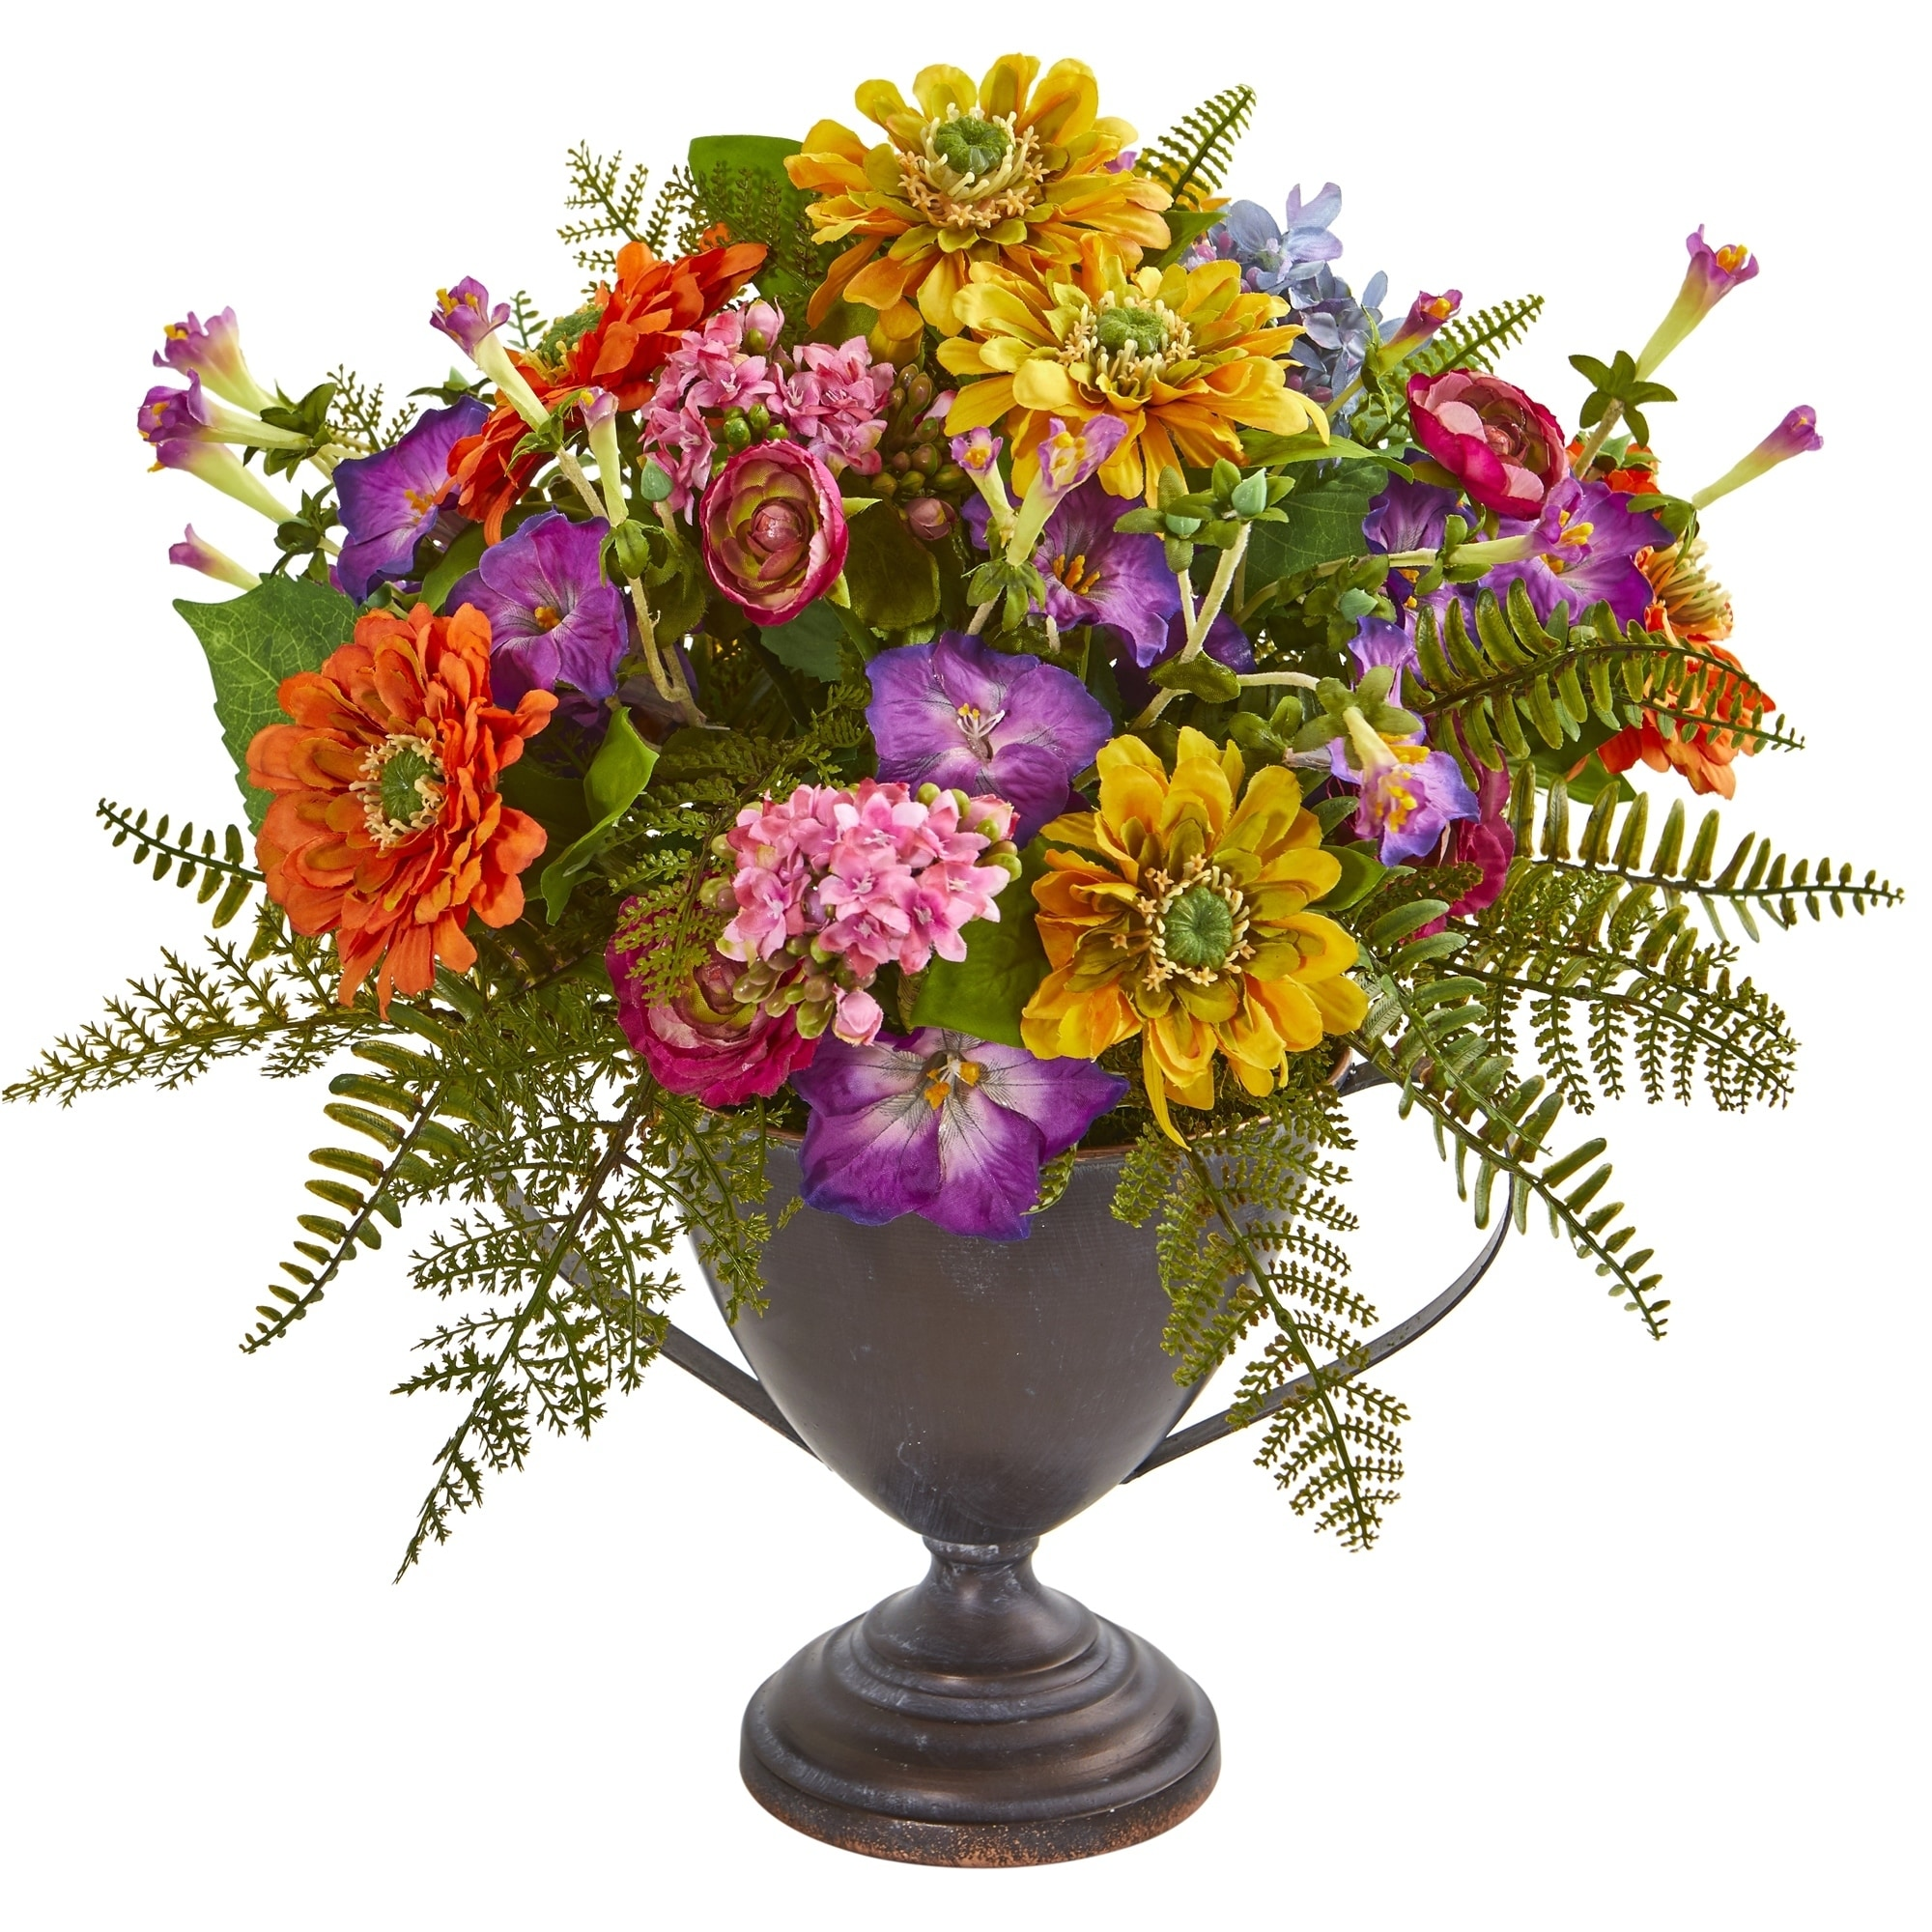 Mixed Floral Artificial Arrangement in Goblet